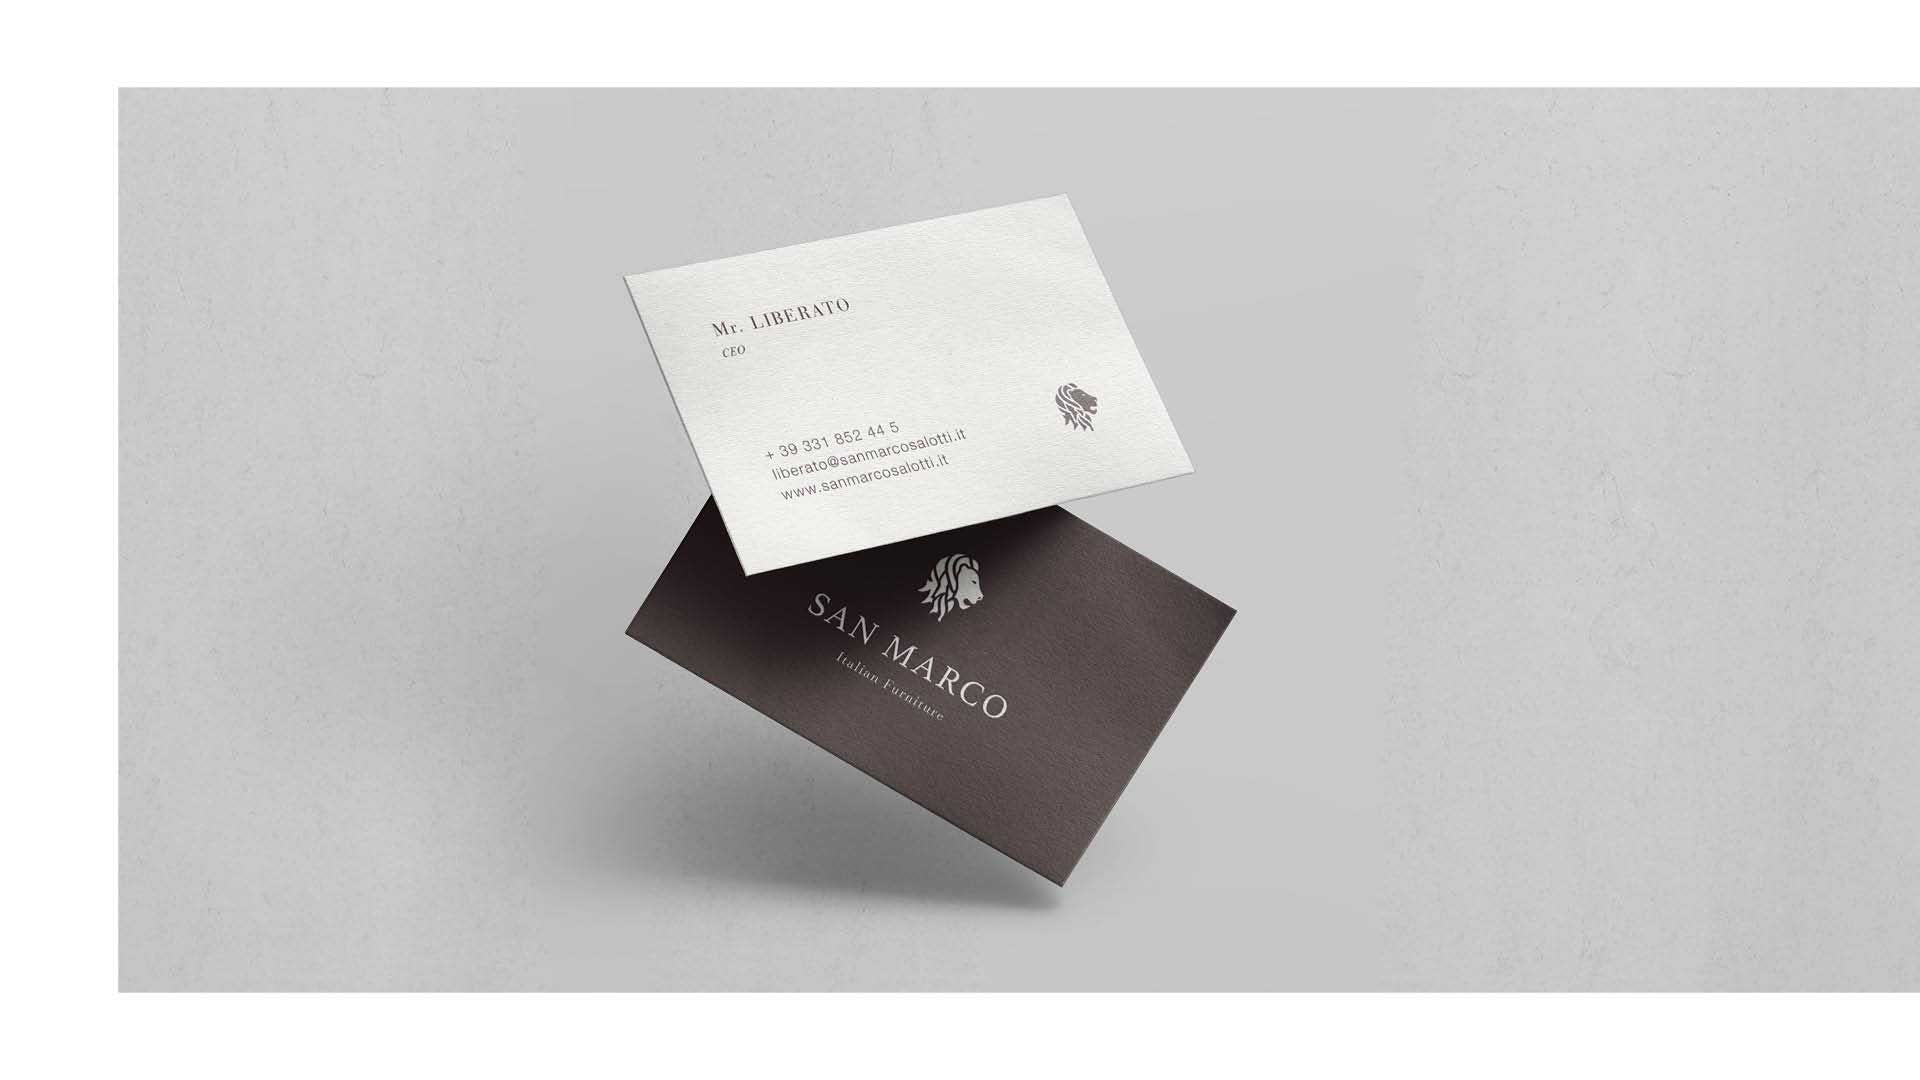 SanMarco-BrandIdentity9